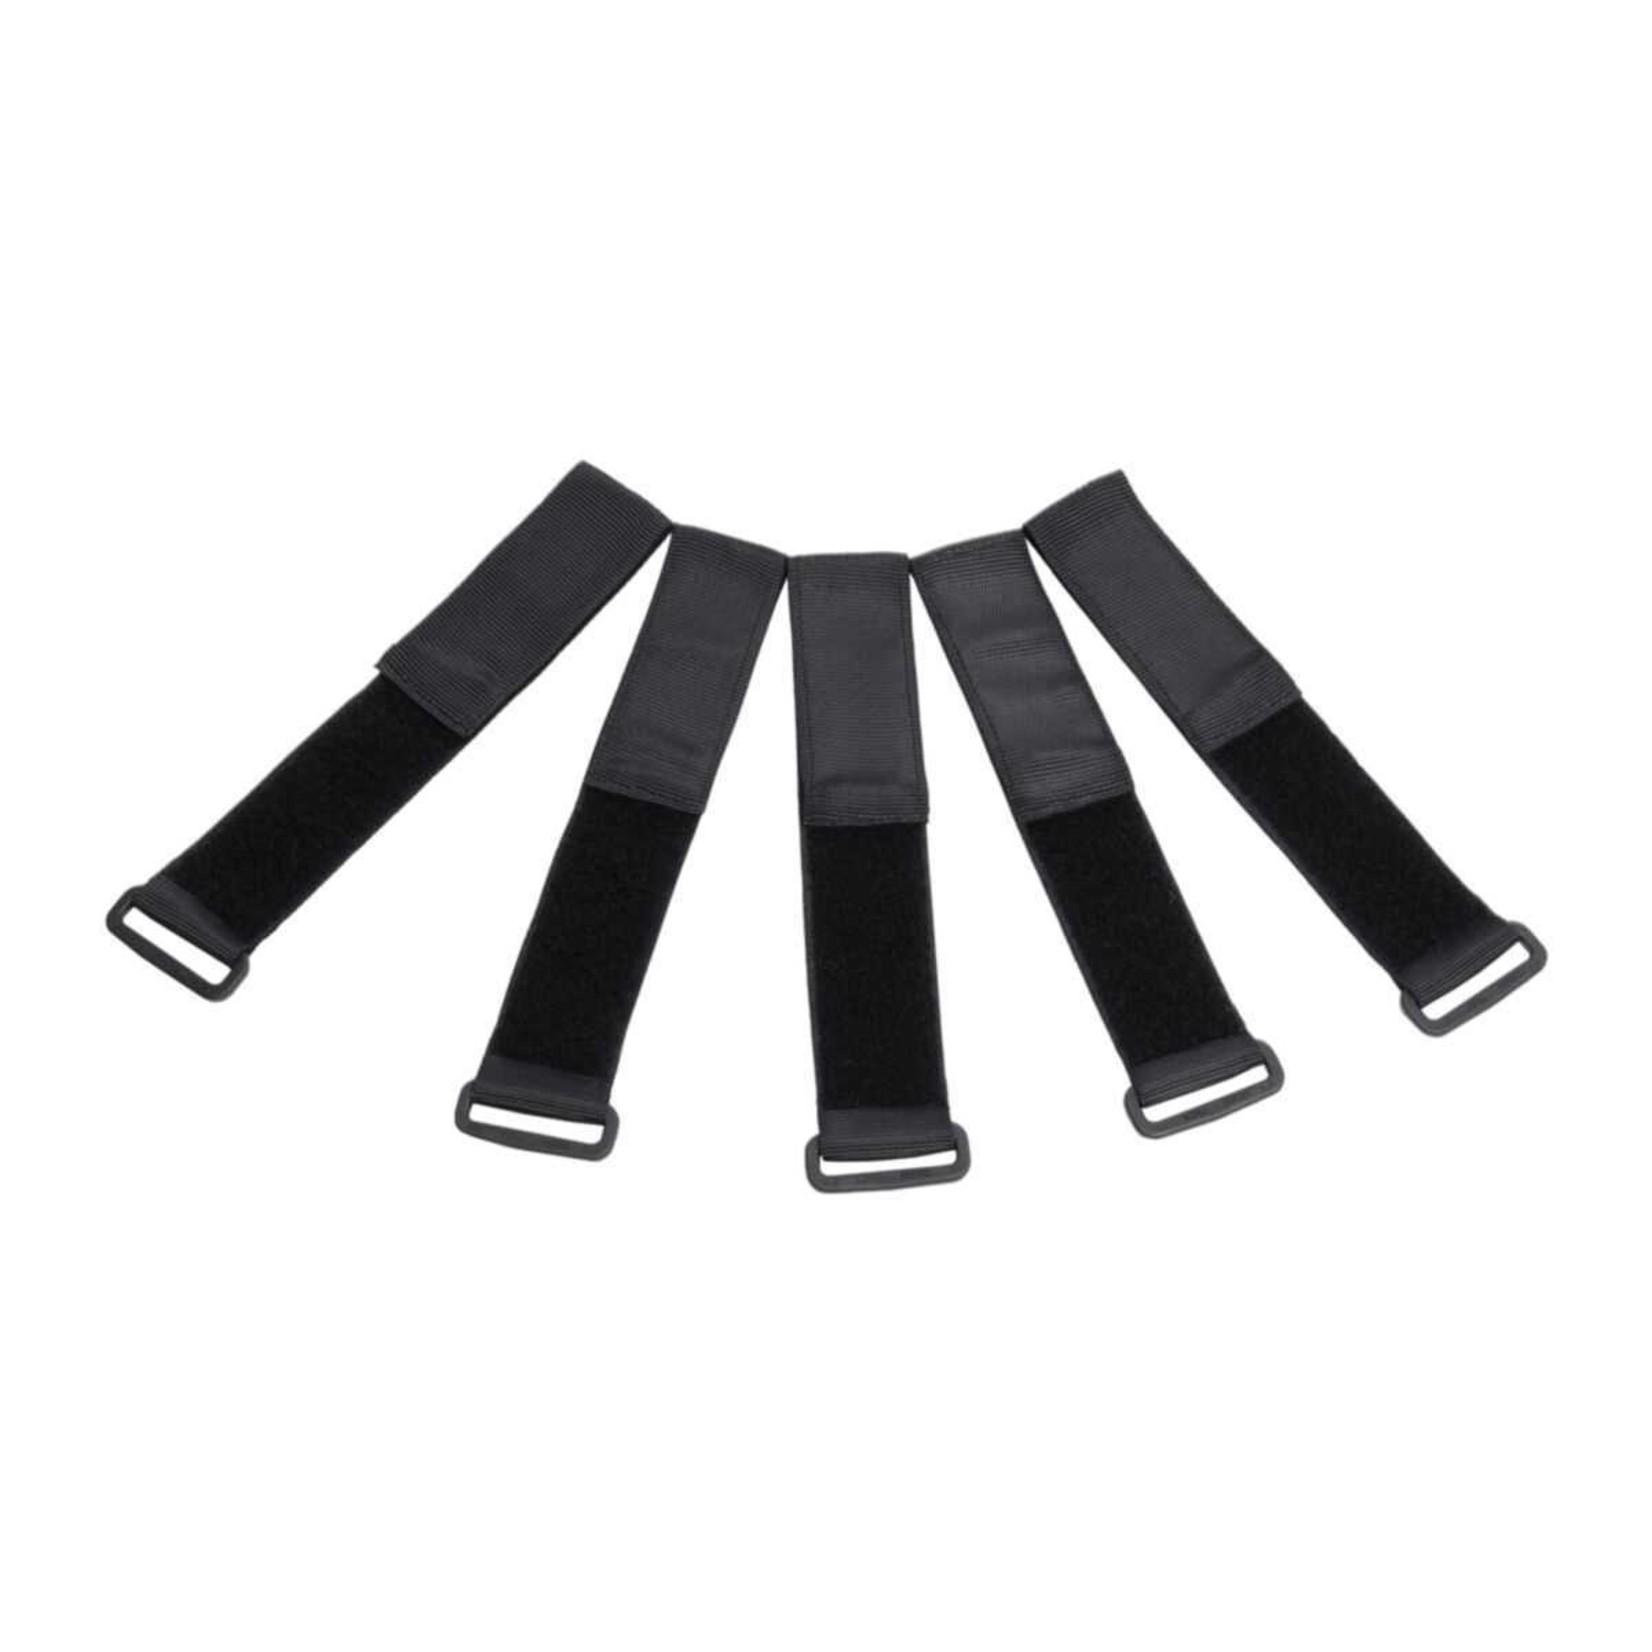 Swagman Swagman Tailgate Pad Velcro Straps, Tailwhip, Set of 5